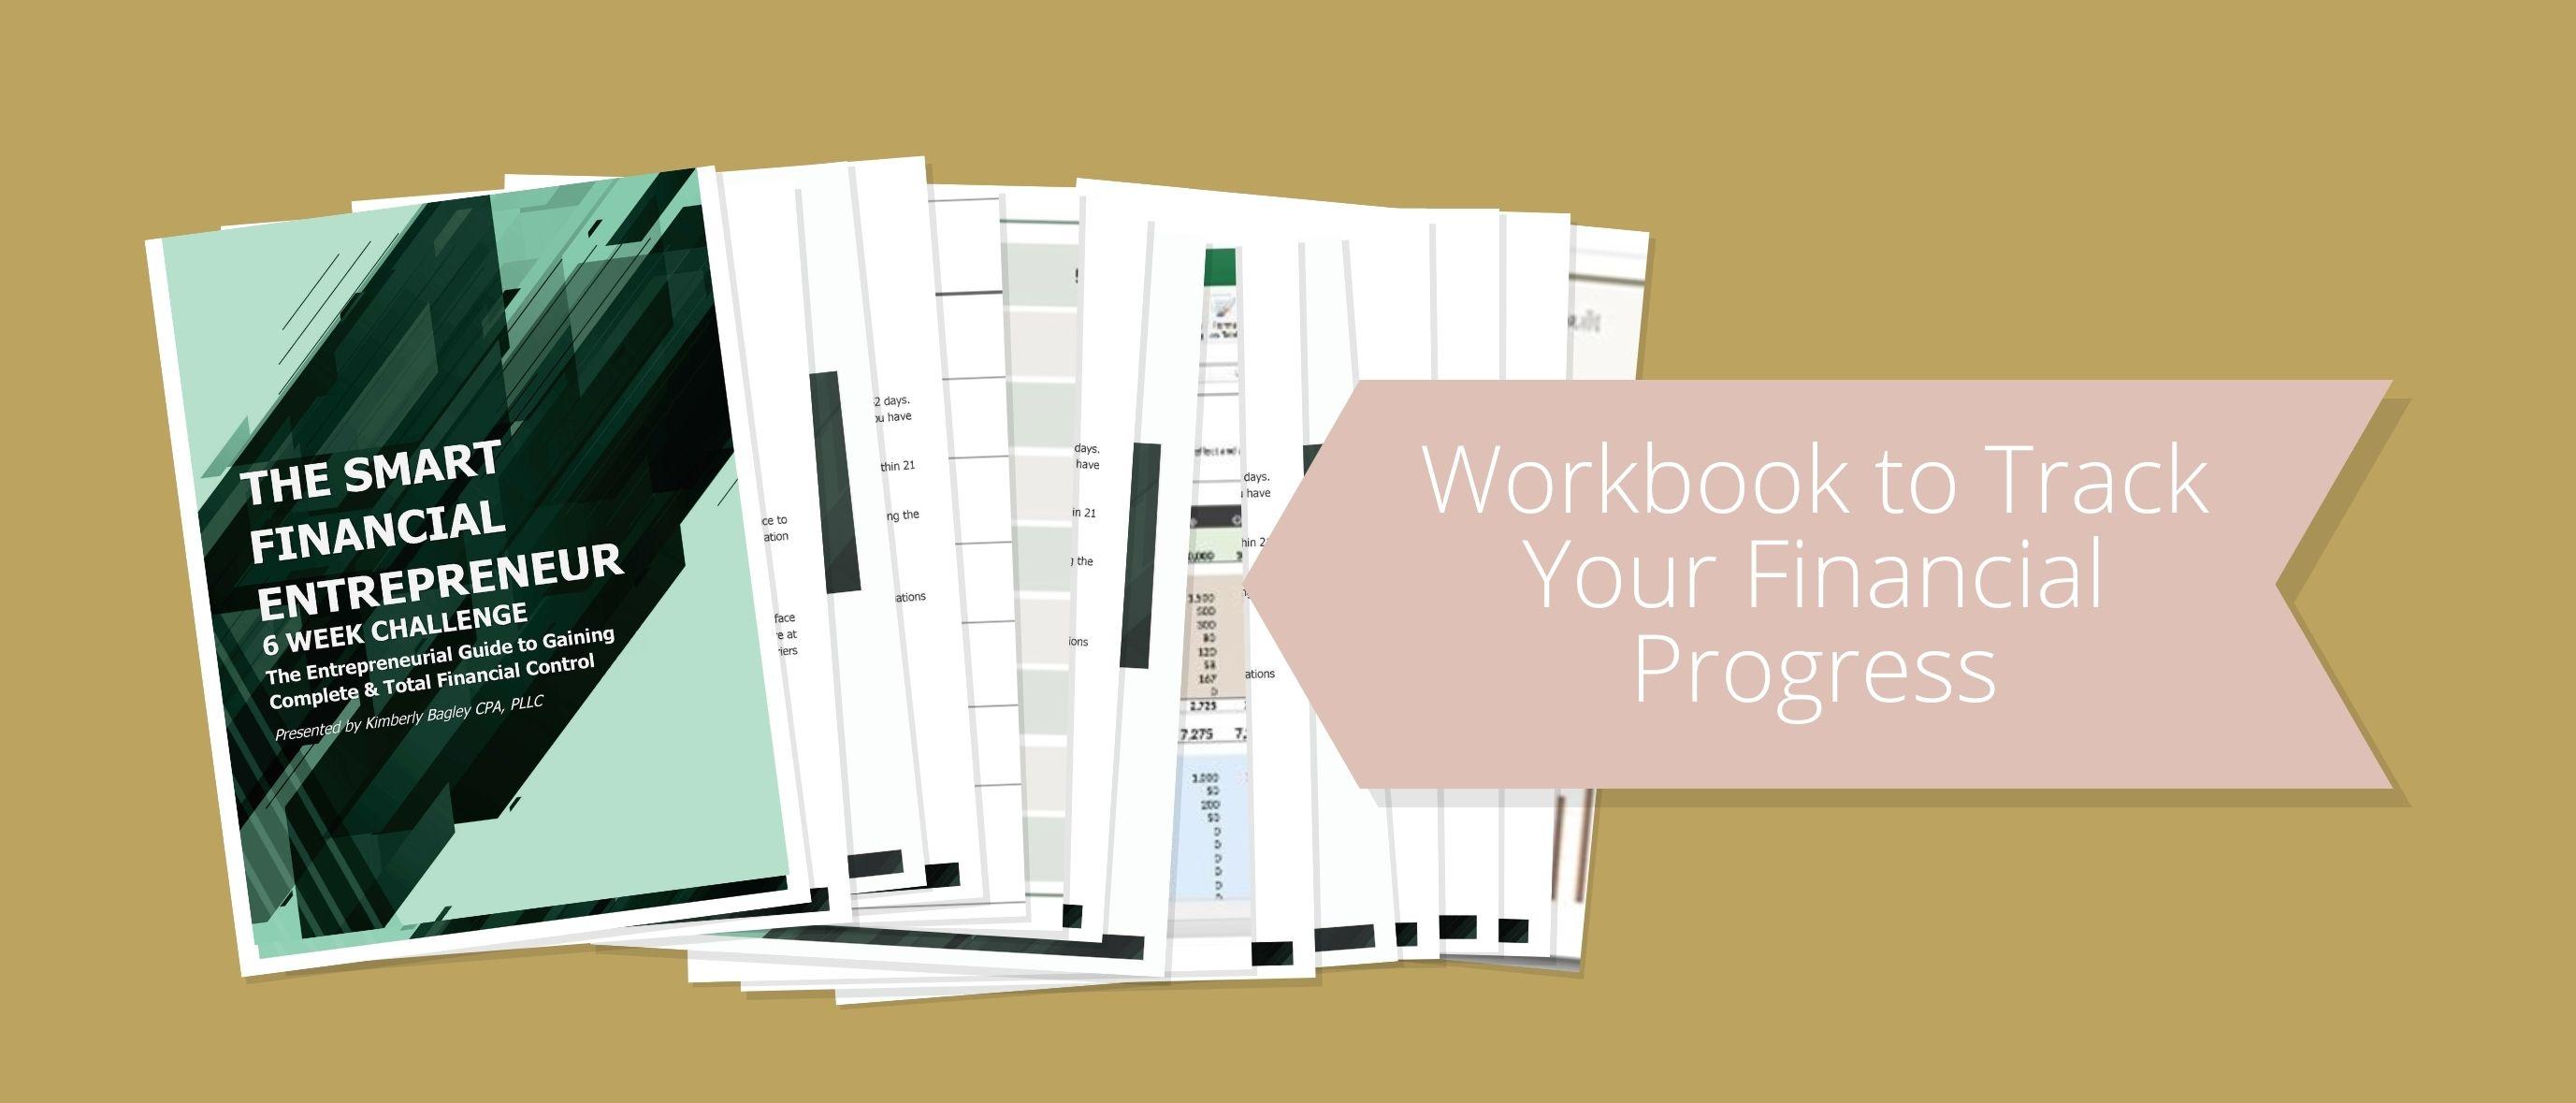 Smart Financial Entrepreneur workbook